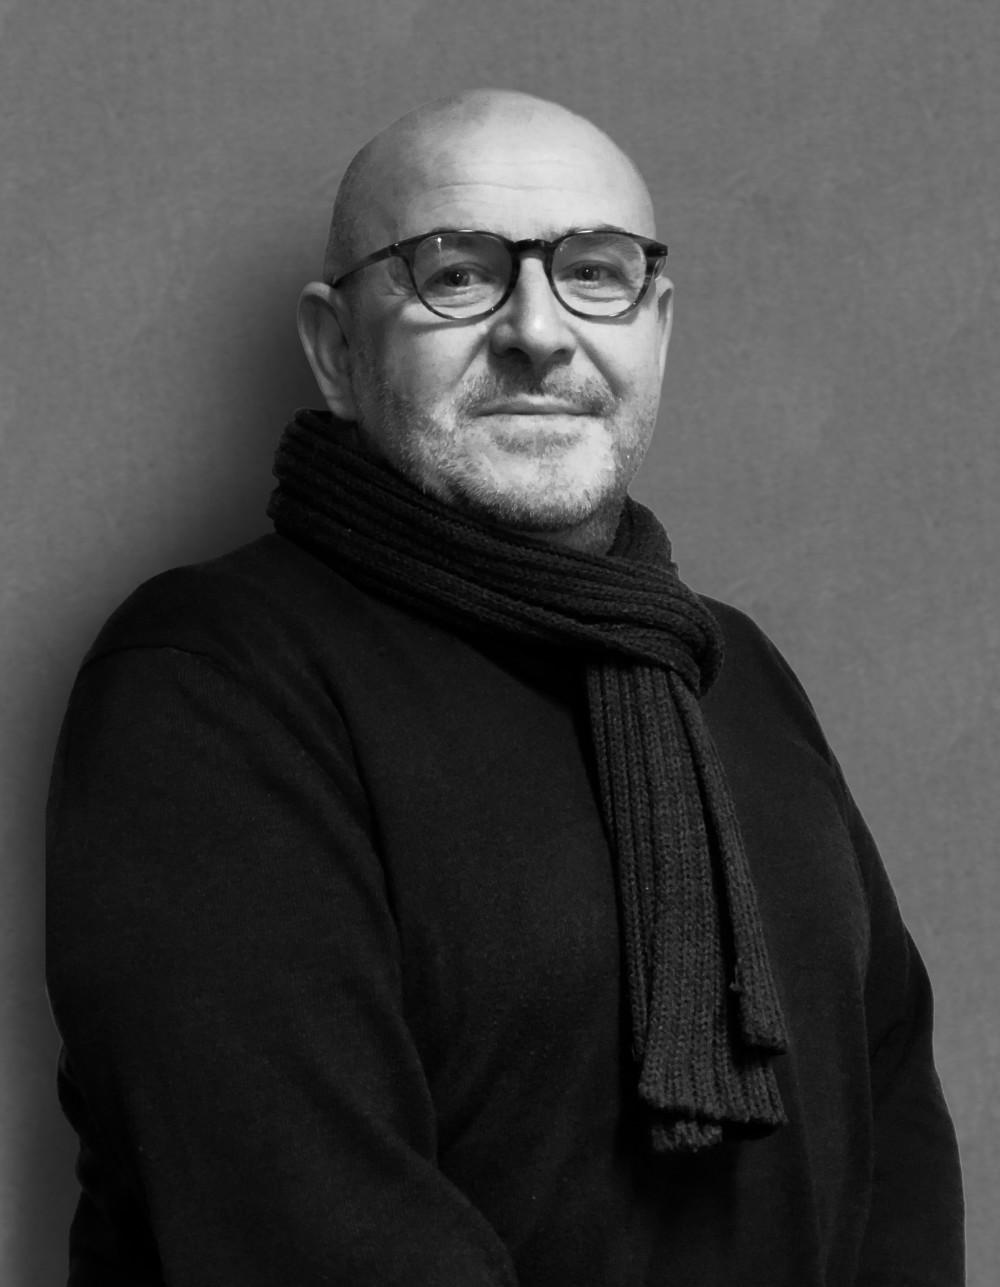 https://www.studioarco.eu/wp-content/uploads/2016/02/M.Castelli-e1579459373238-1000x1287.jpg